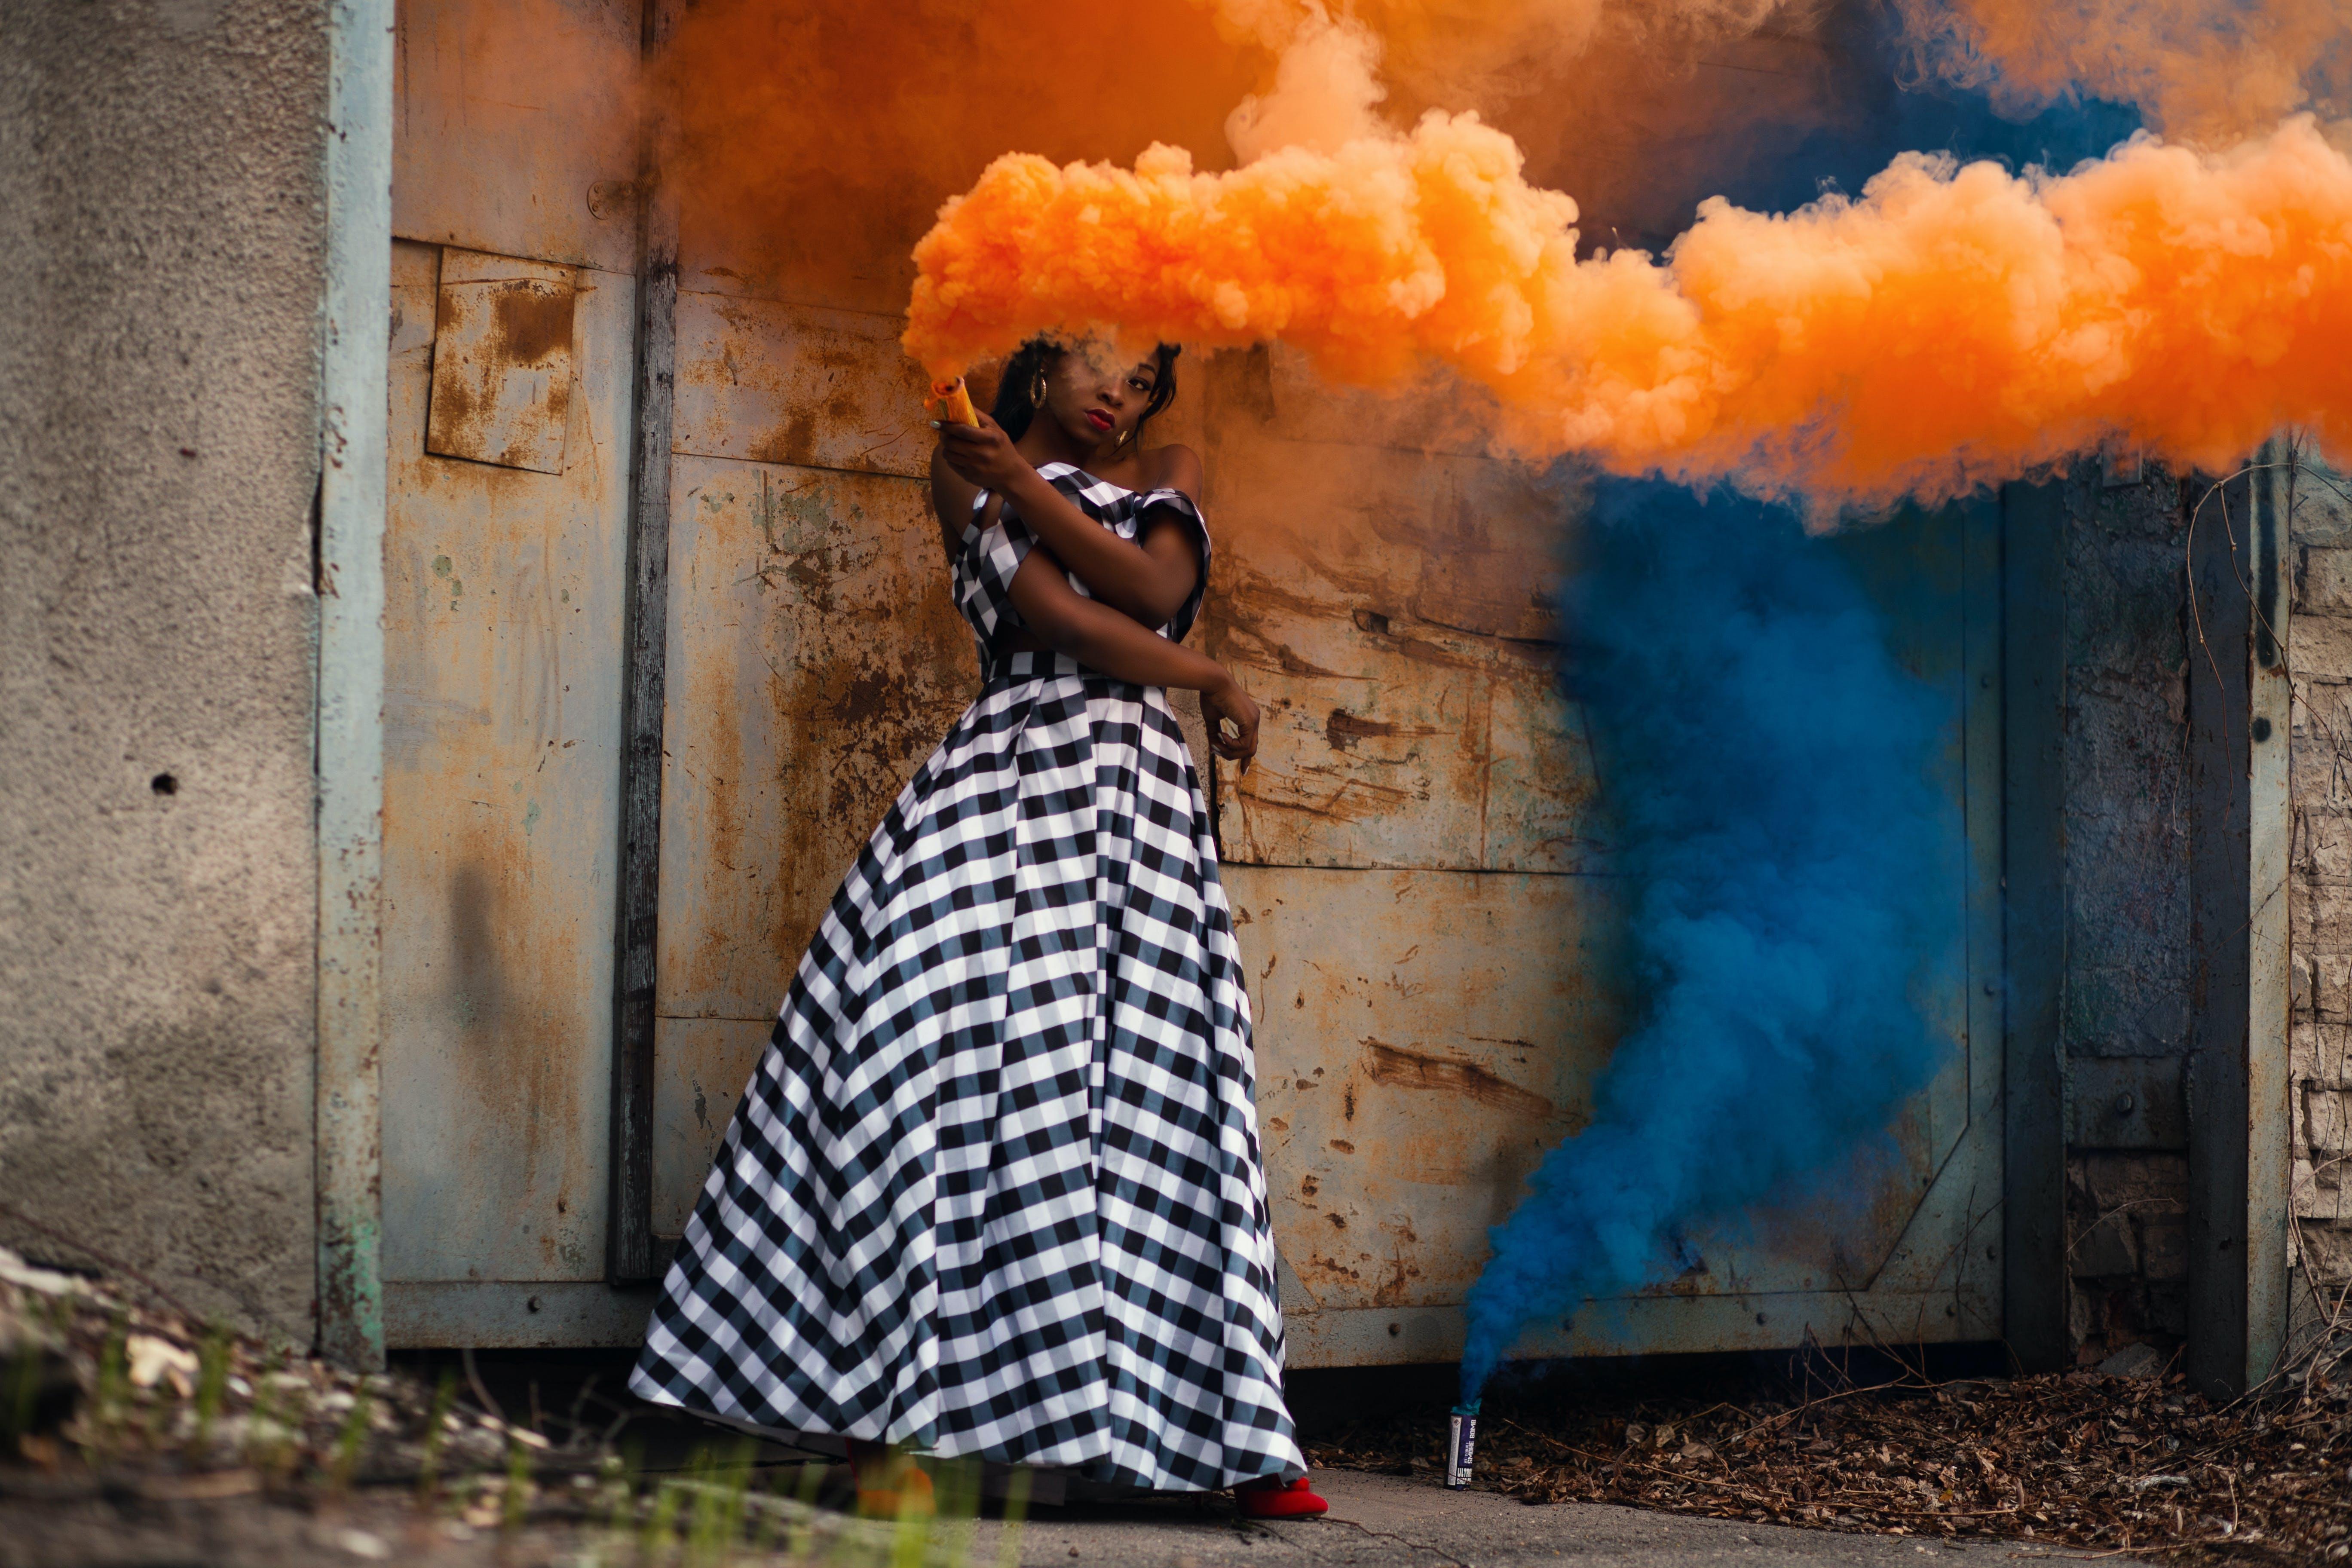 Woman in White and Black Dress Holding Orange Smoke